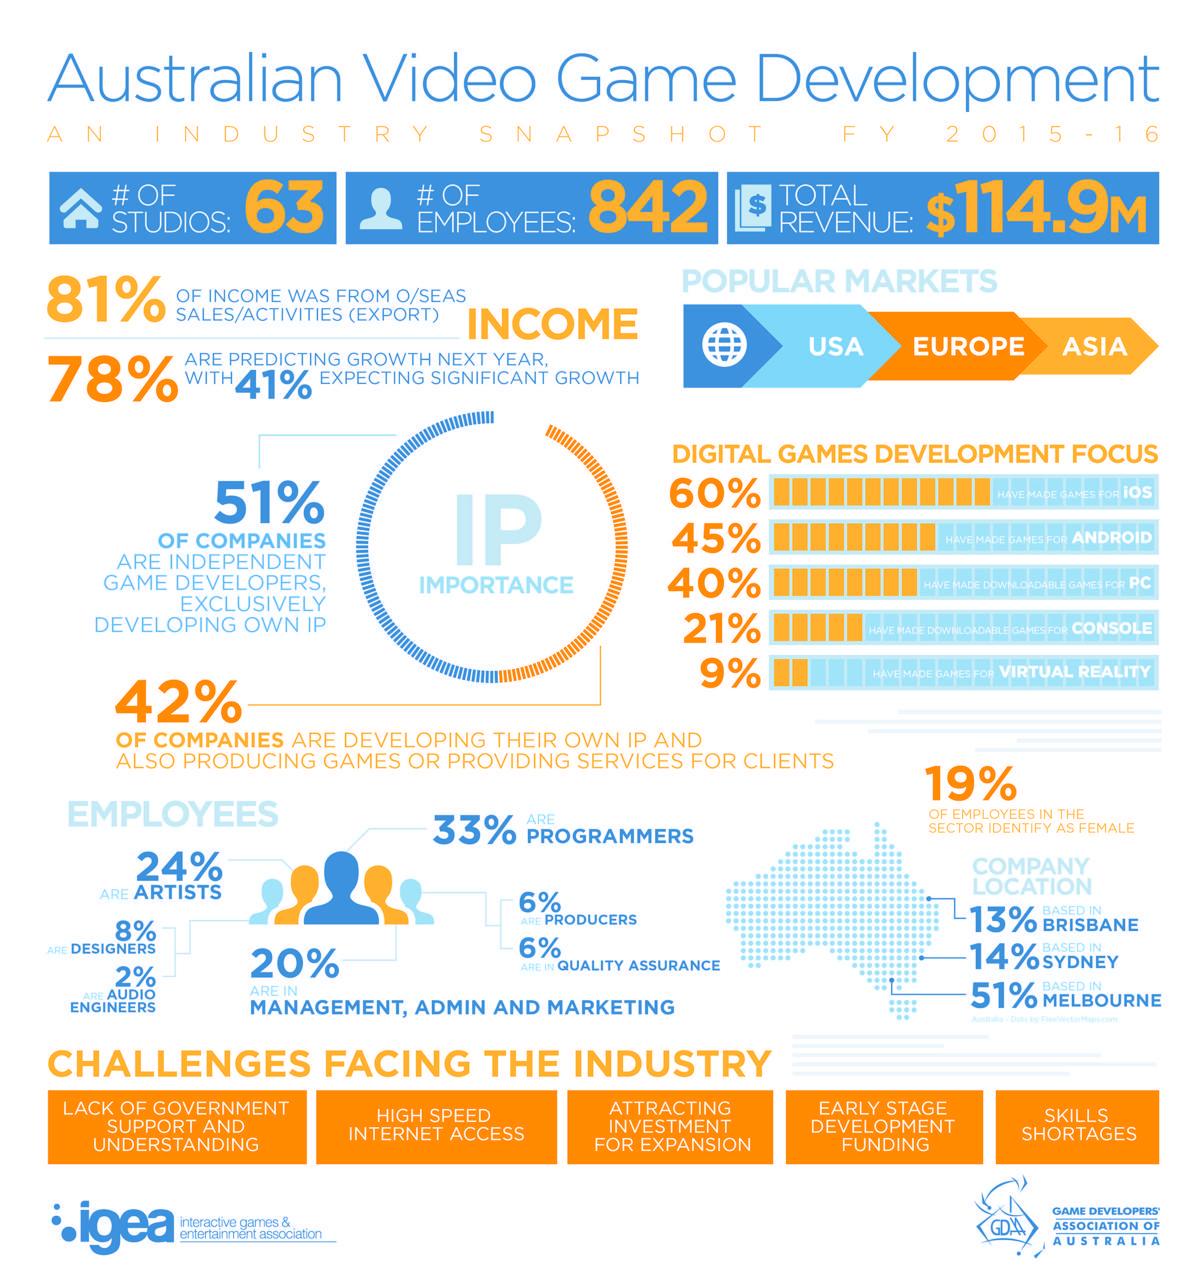 IGEA's 2015-2016 Australian Video Game Development Industry Snapshot